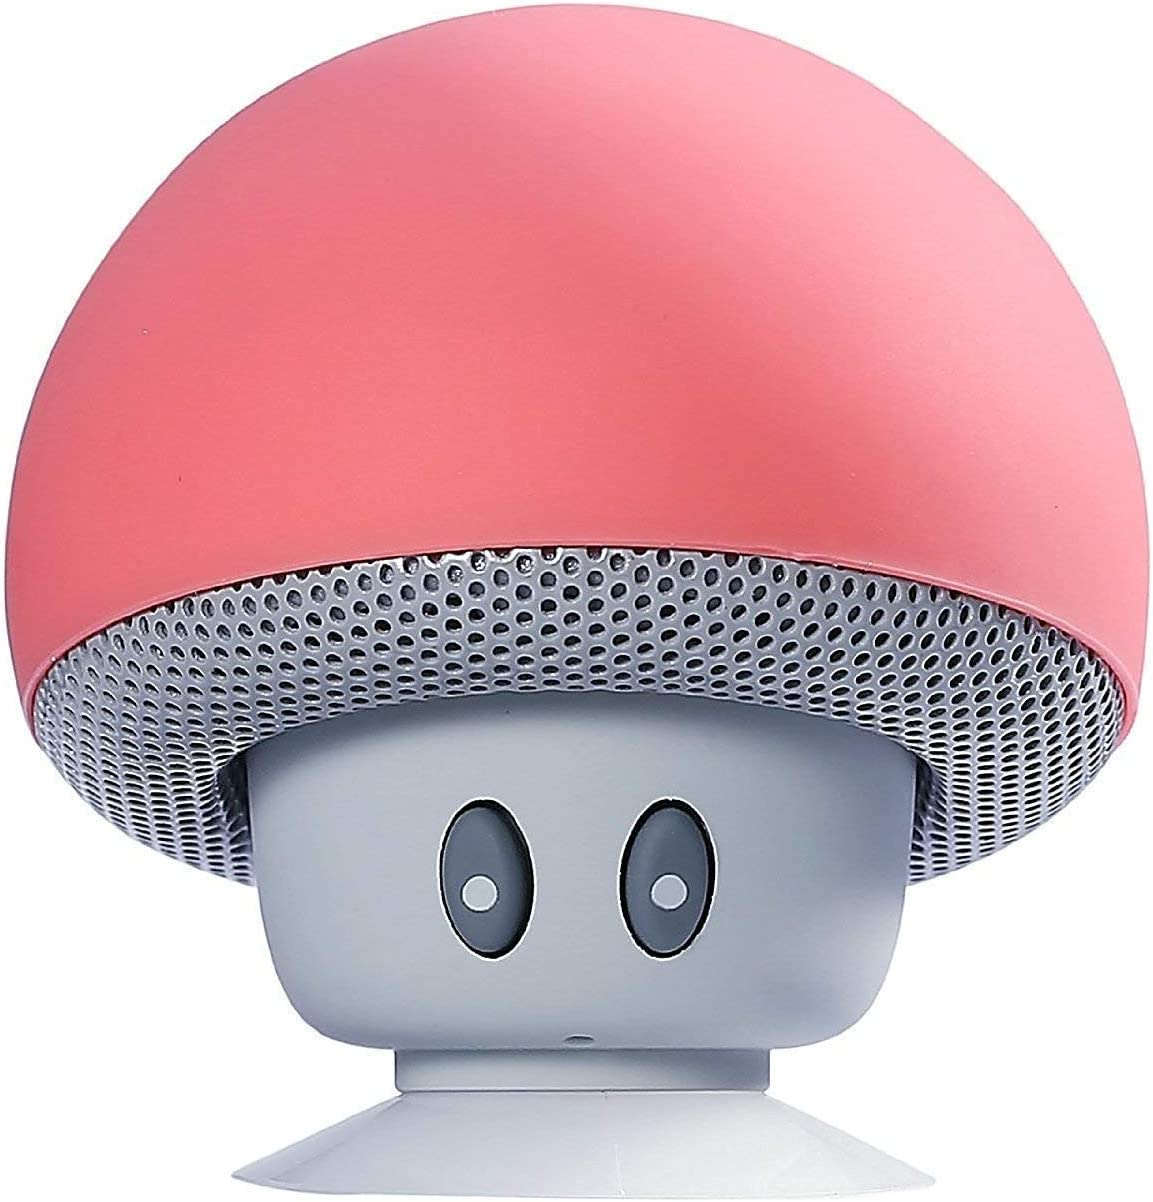 Sudroid Mushroom Mini Cheap Wireless Portable Bluetooth Speakers